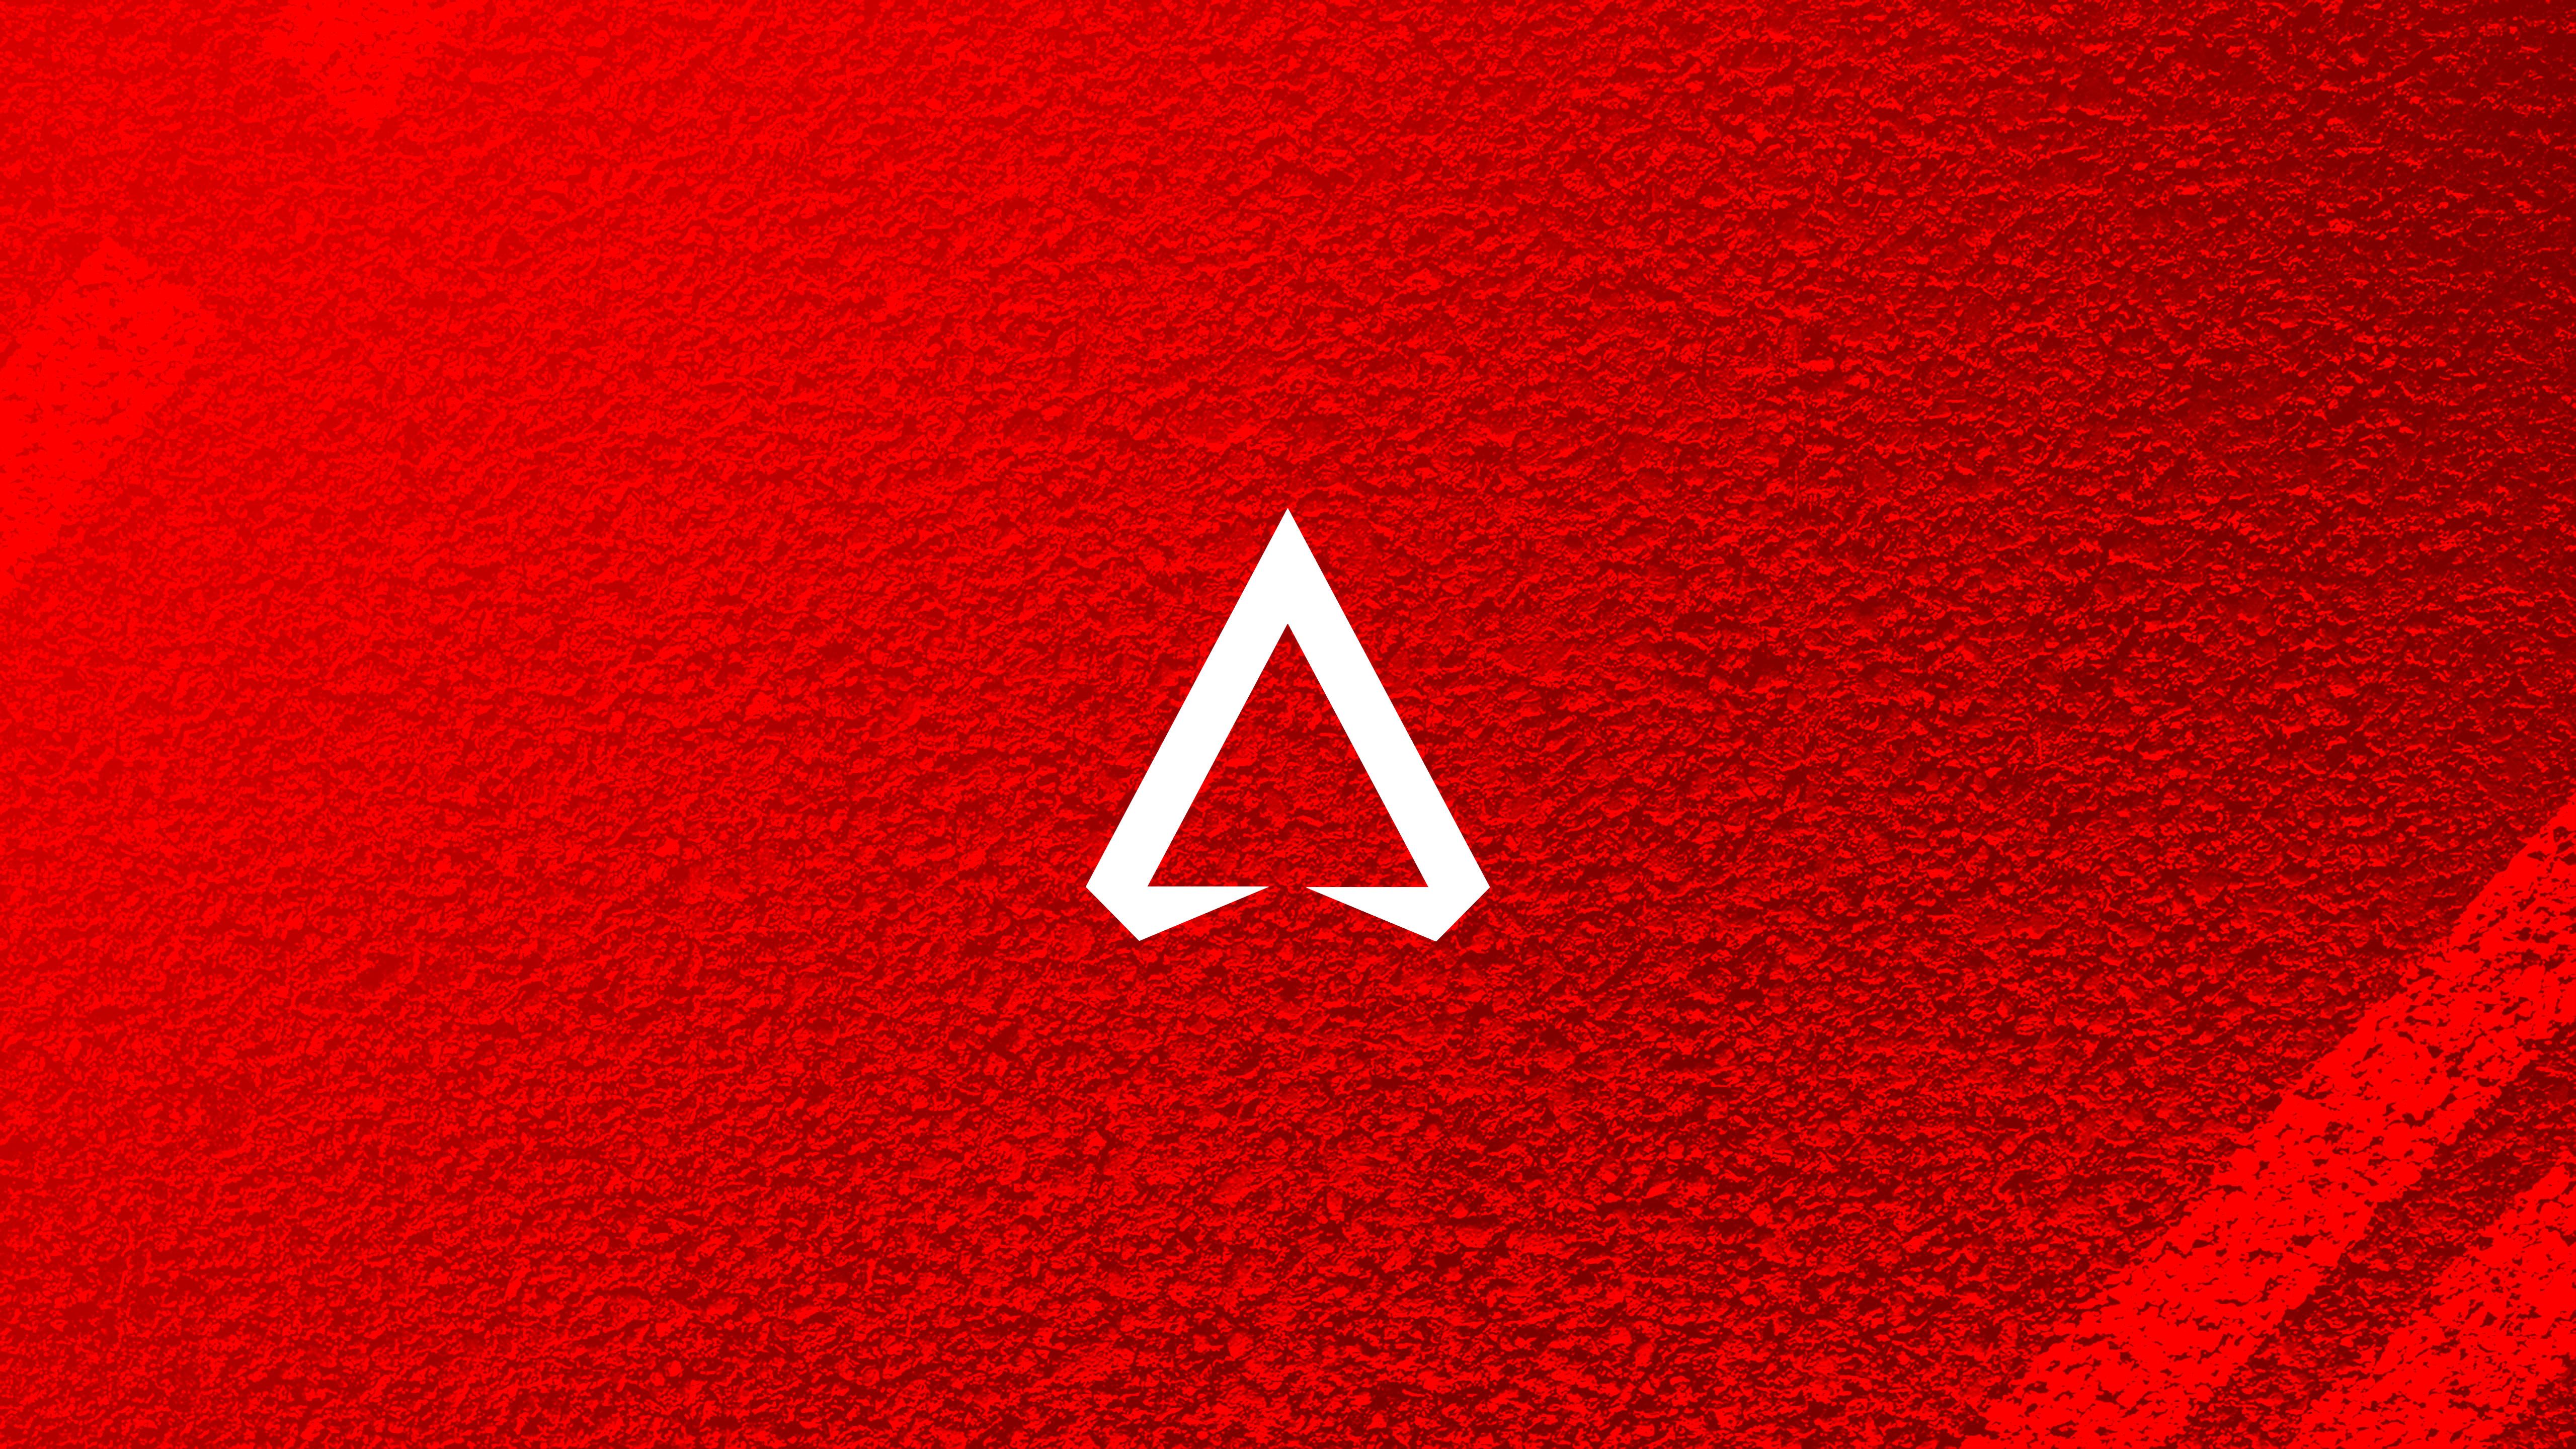 Apex Legends Logo Wallpaper, HD Minimalist 4K Wallpapers ...